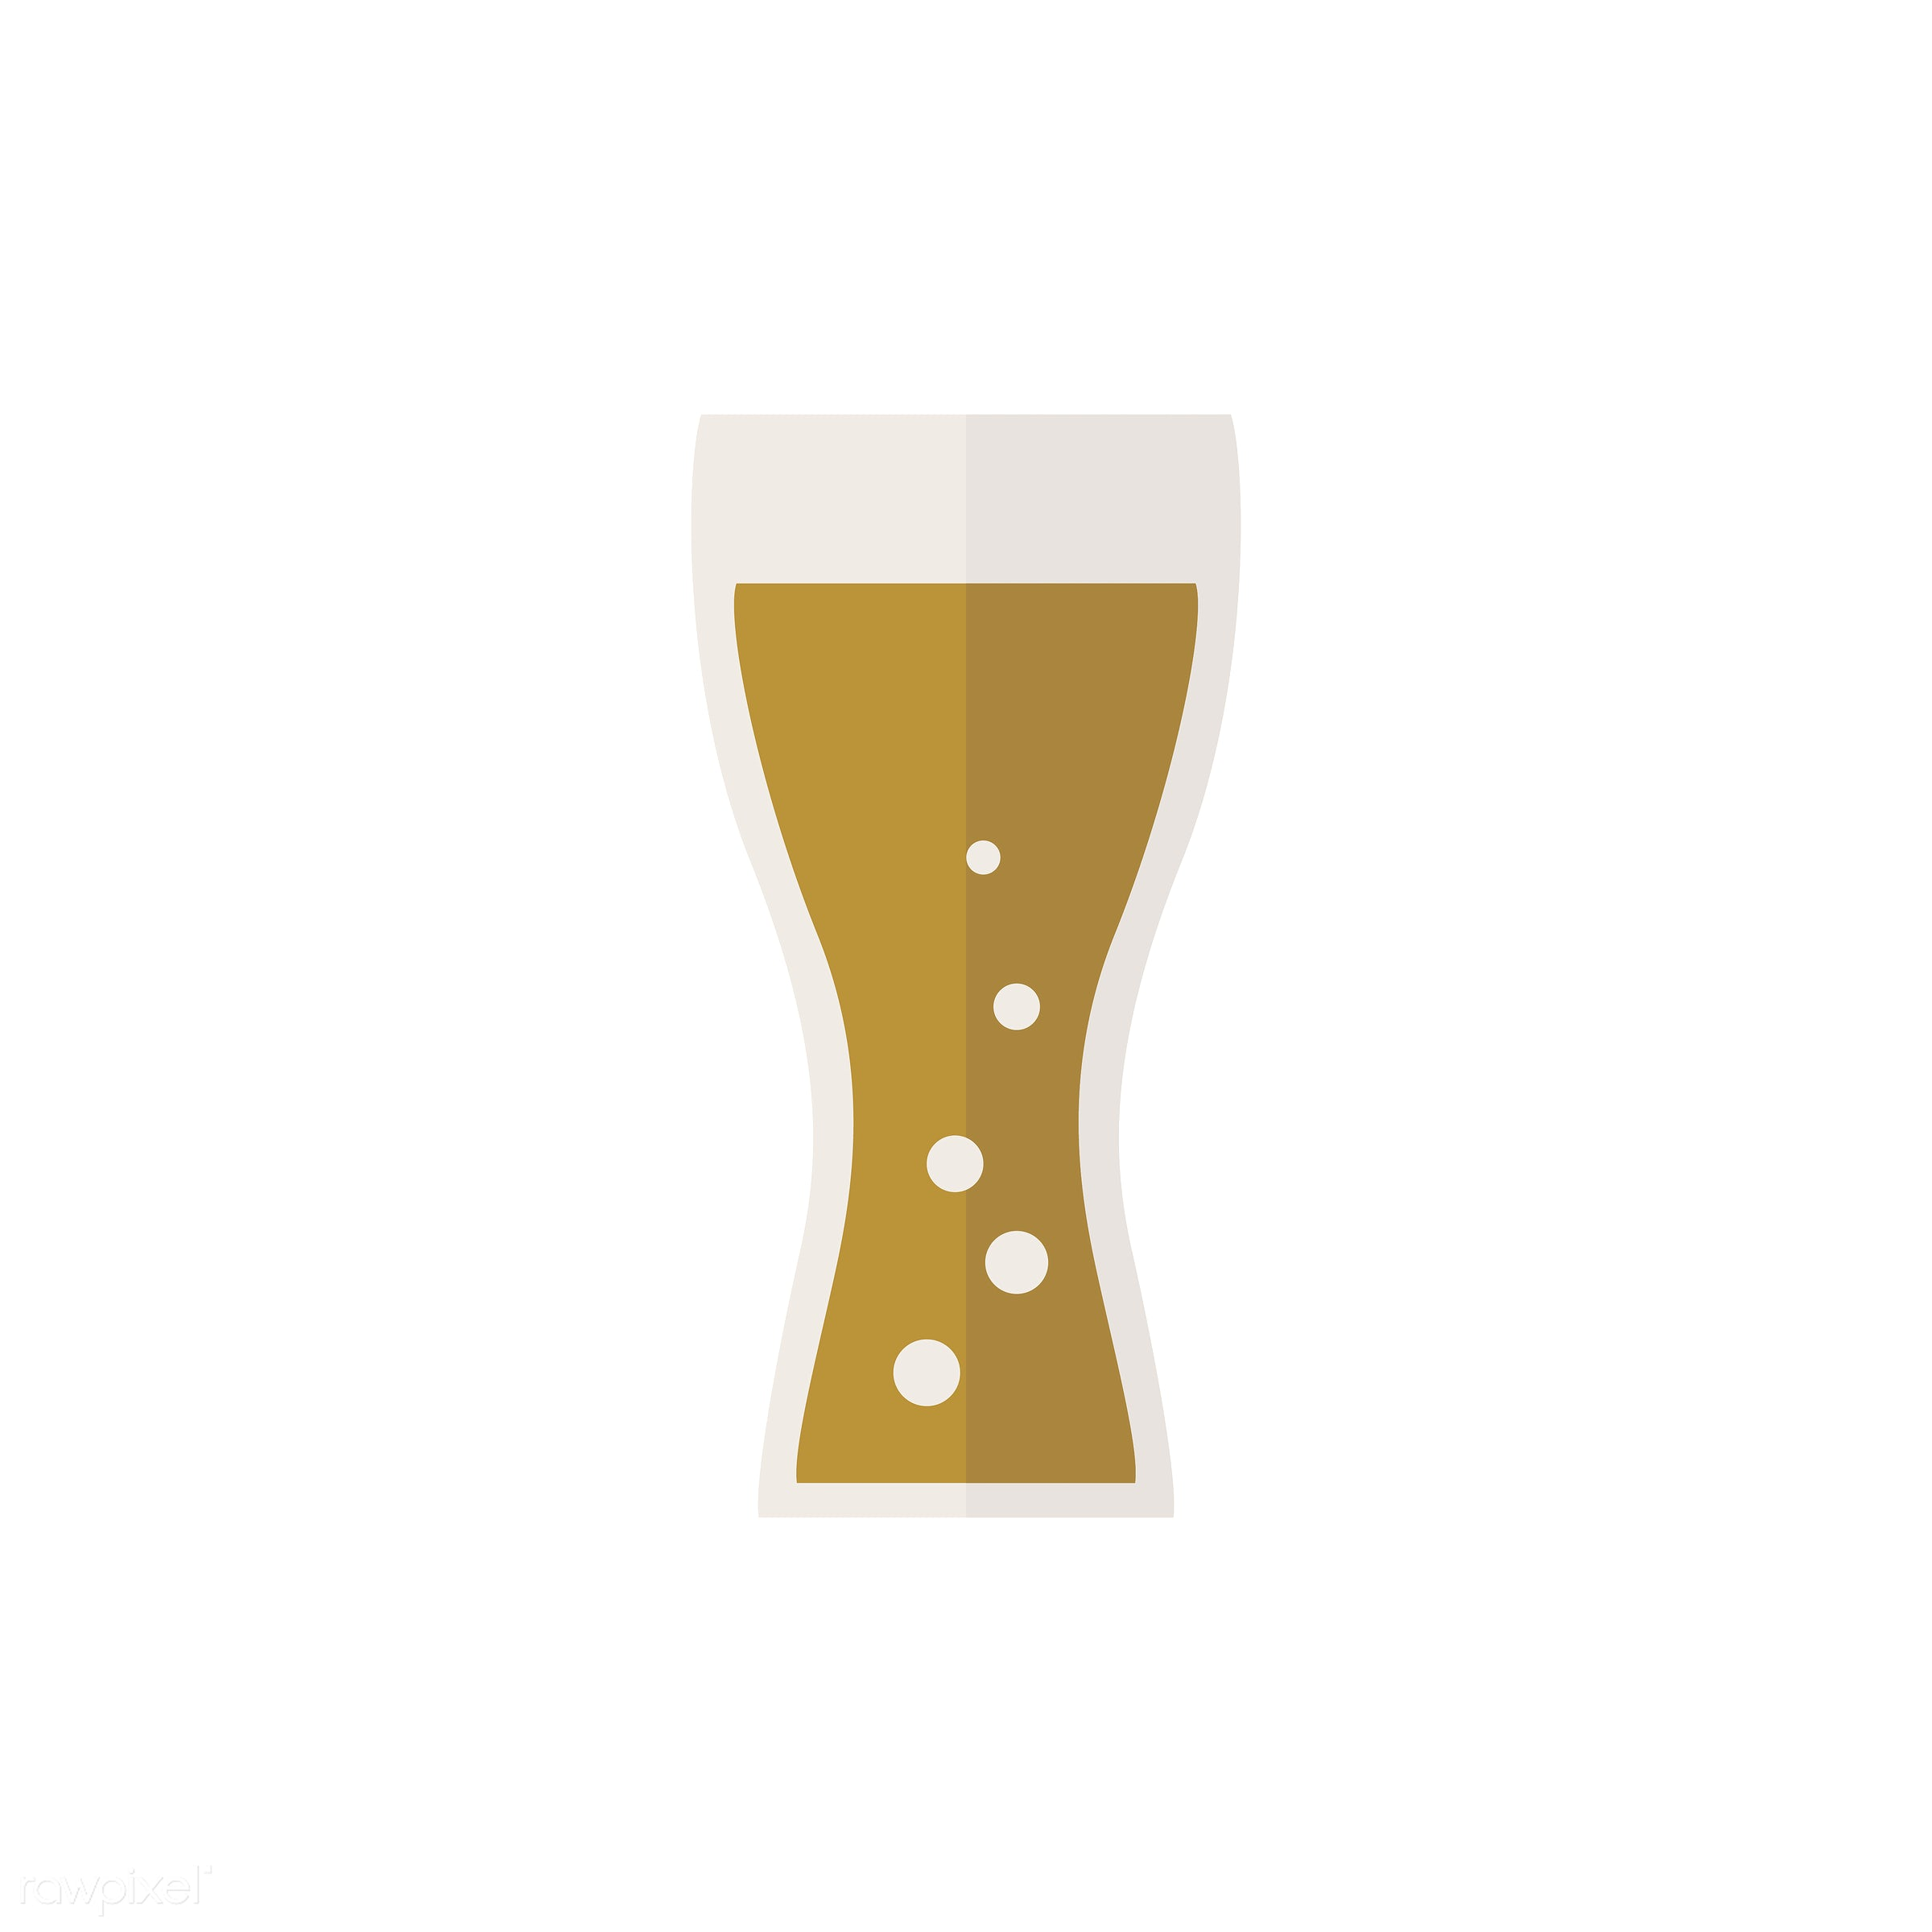 vector, graphic, illustration, icon, symbol, colorful, cute, drink, beverage, water, cola, brown, soda